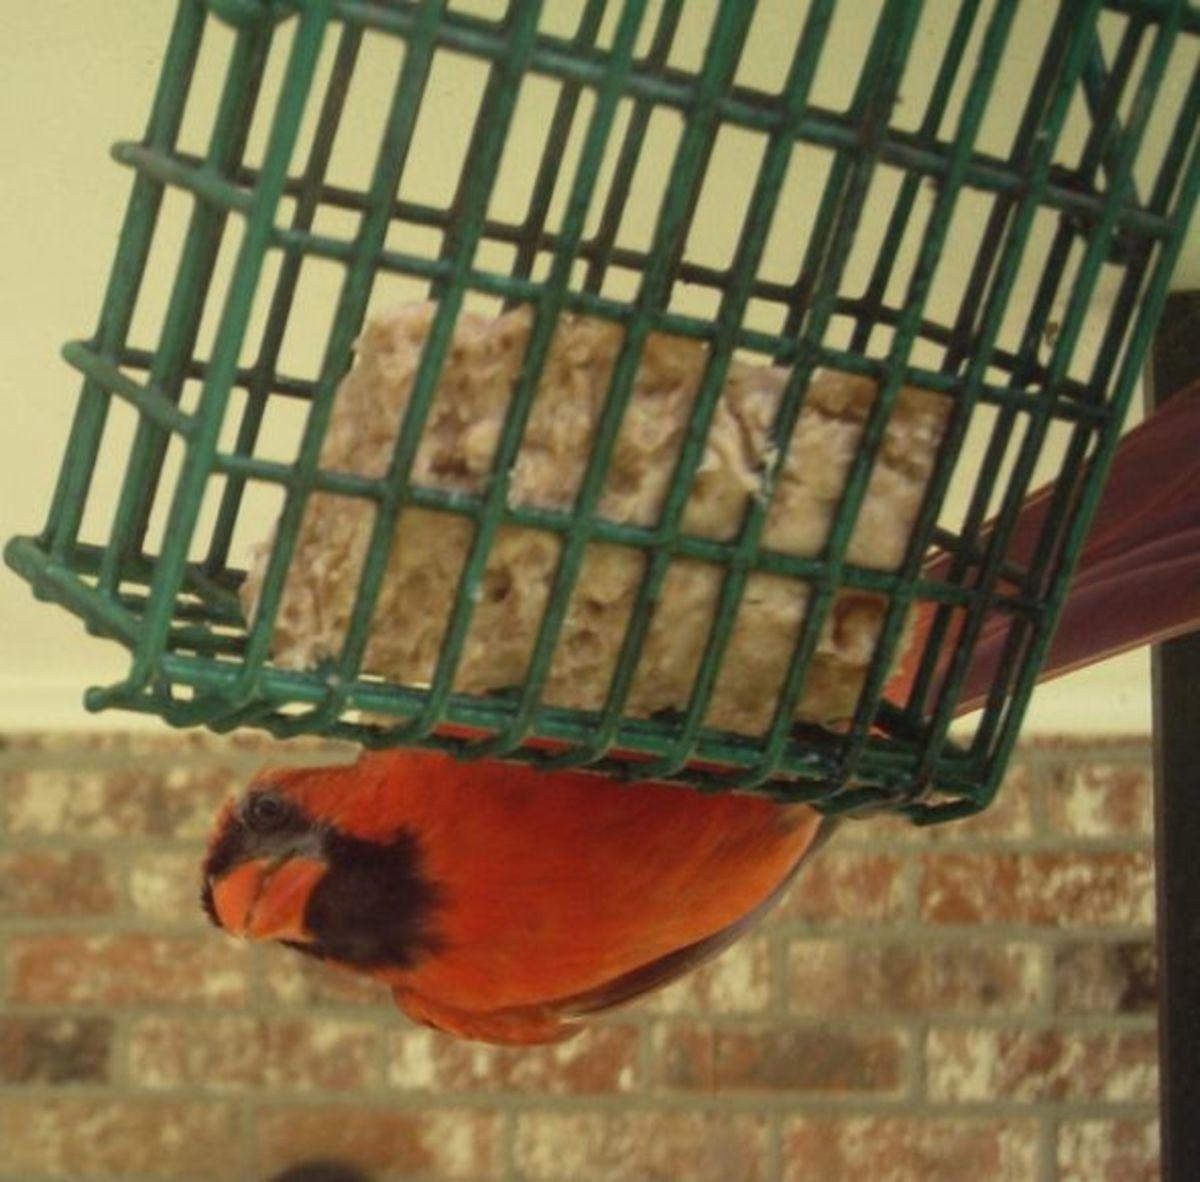 Male Cardinal eating suet